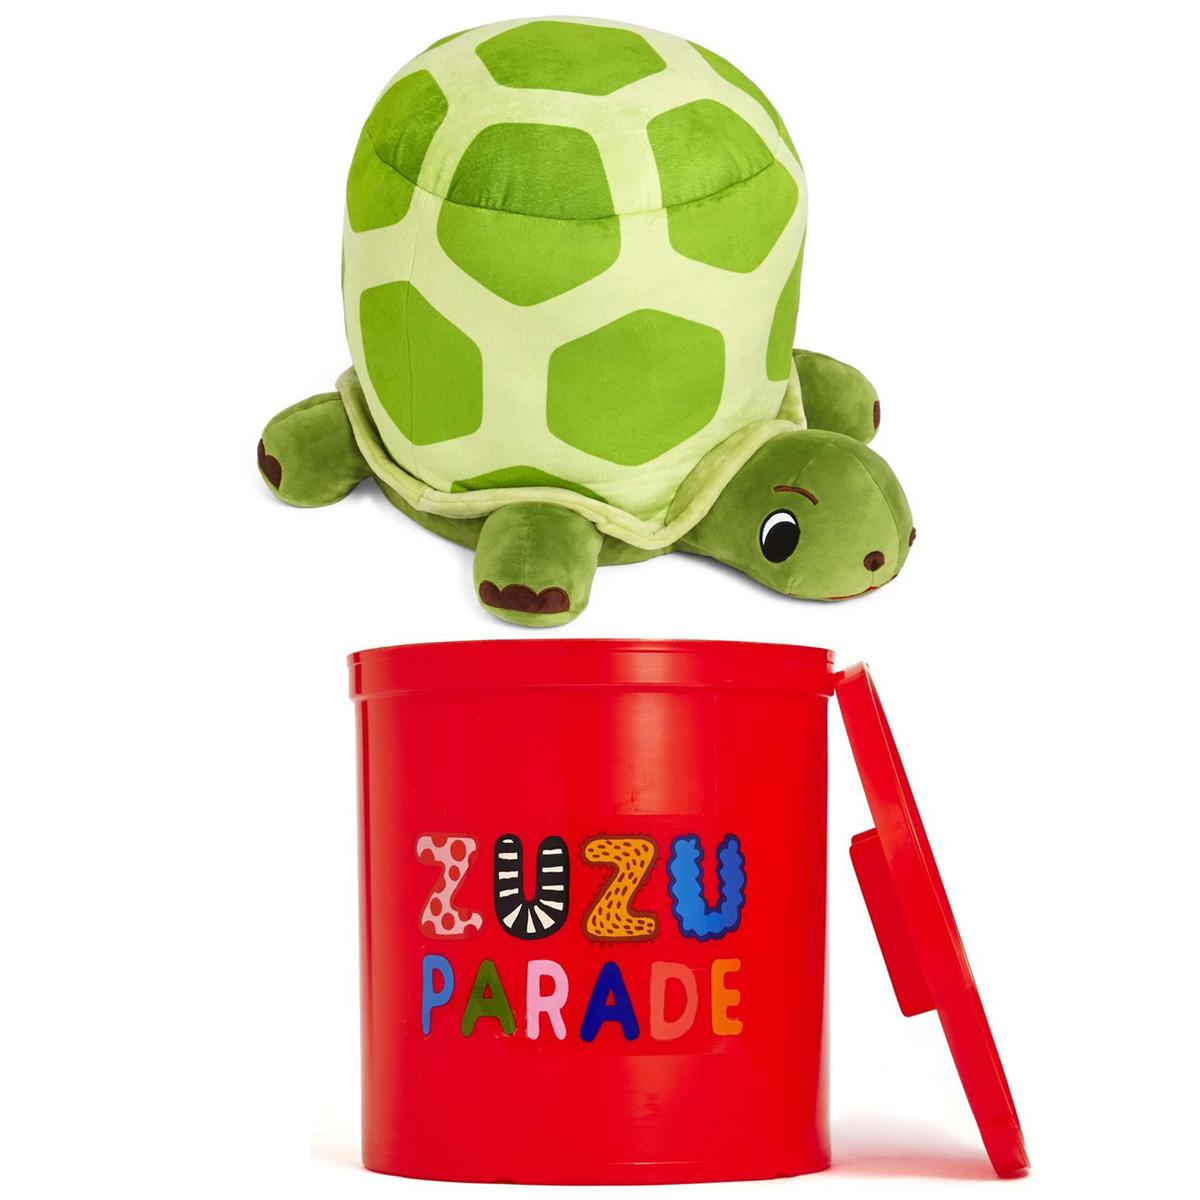 stuffed animal chair lounge covers target zuzu parade kids playroom toy storage